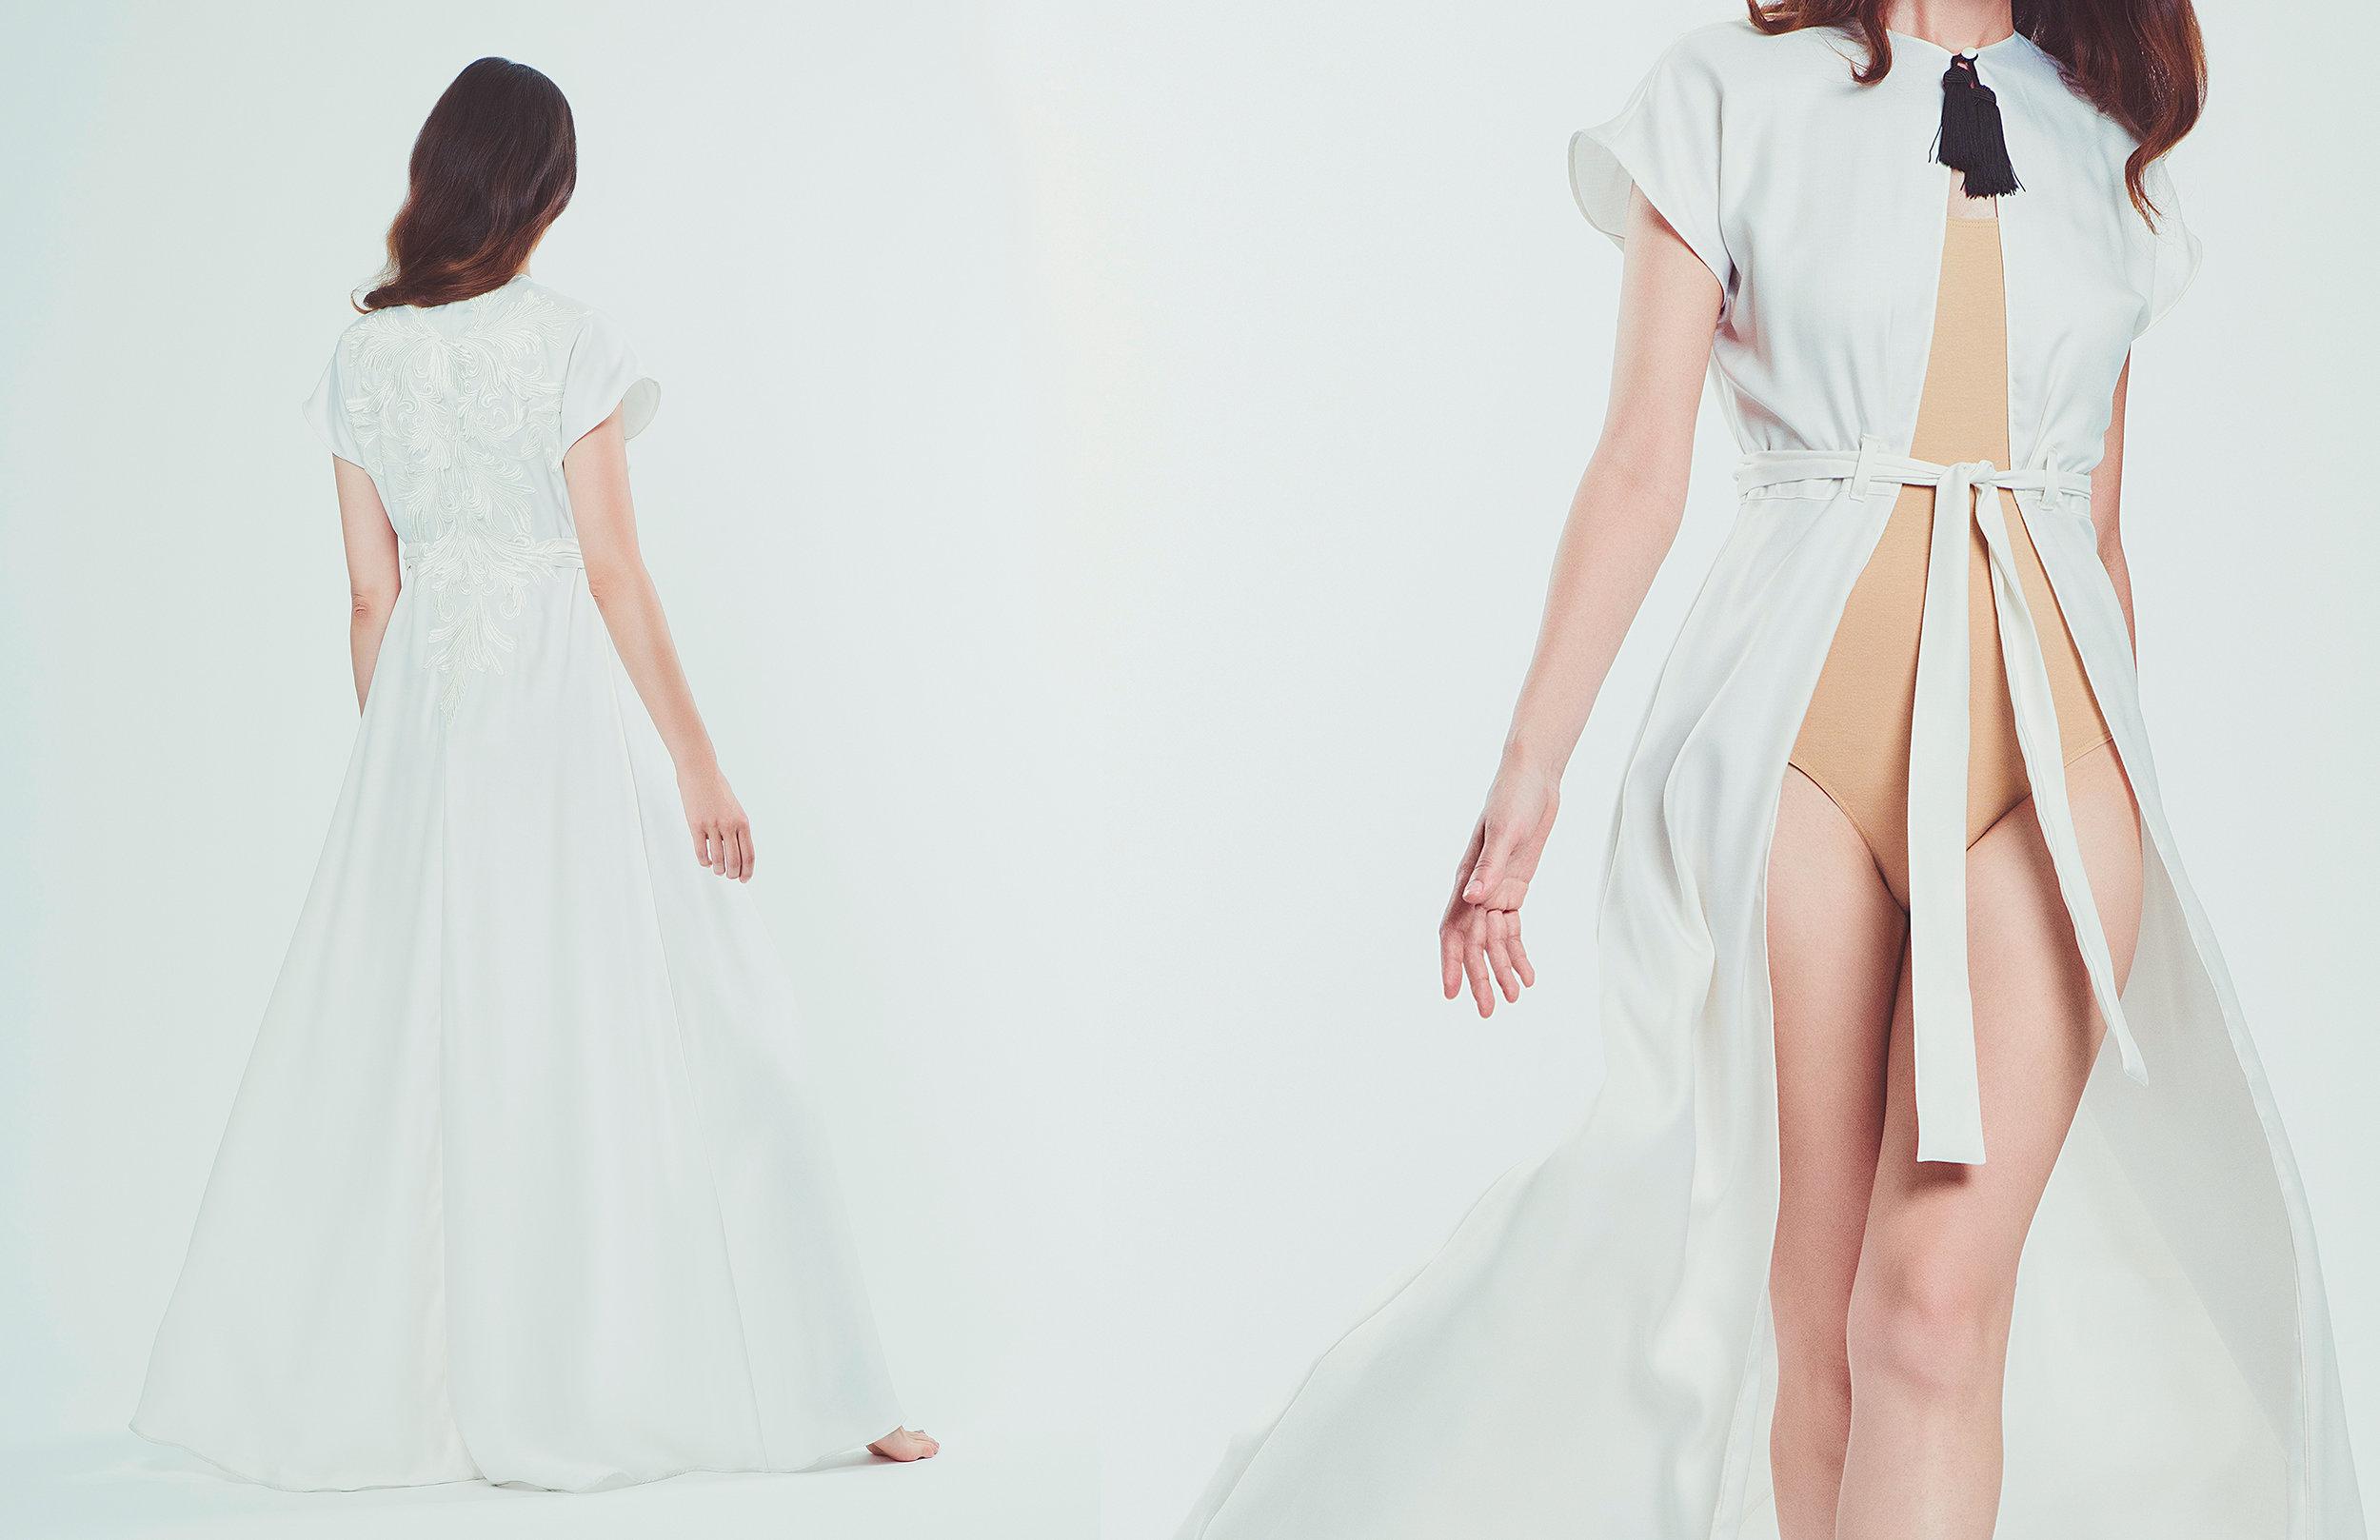 dressing gownM.jpg